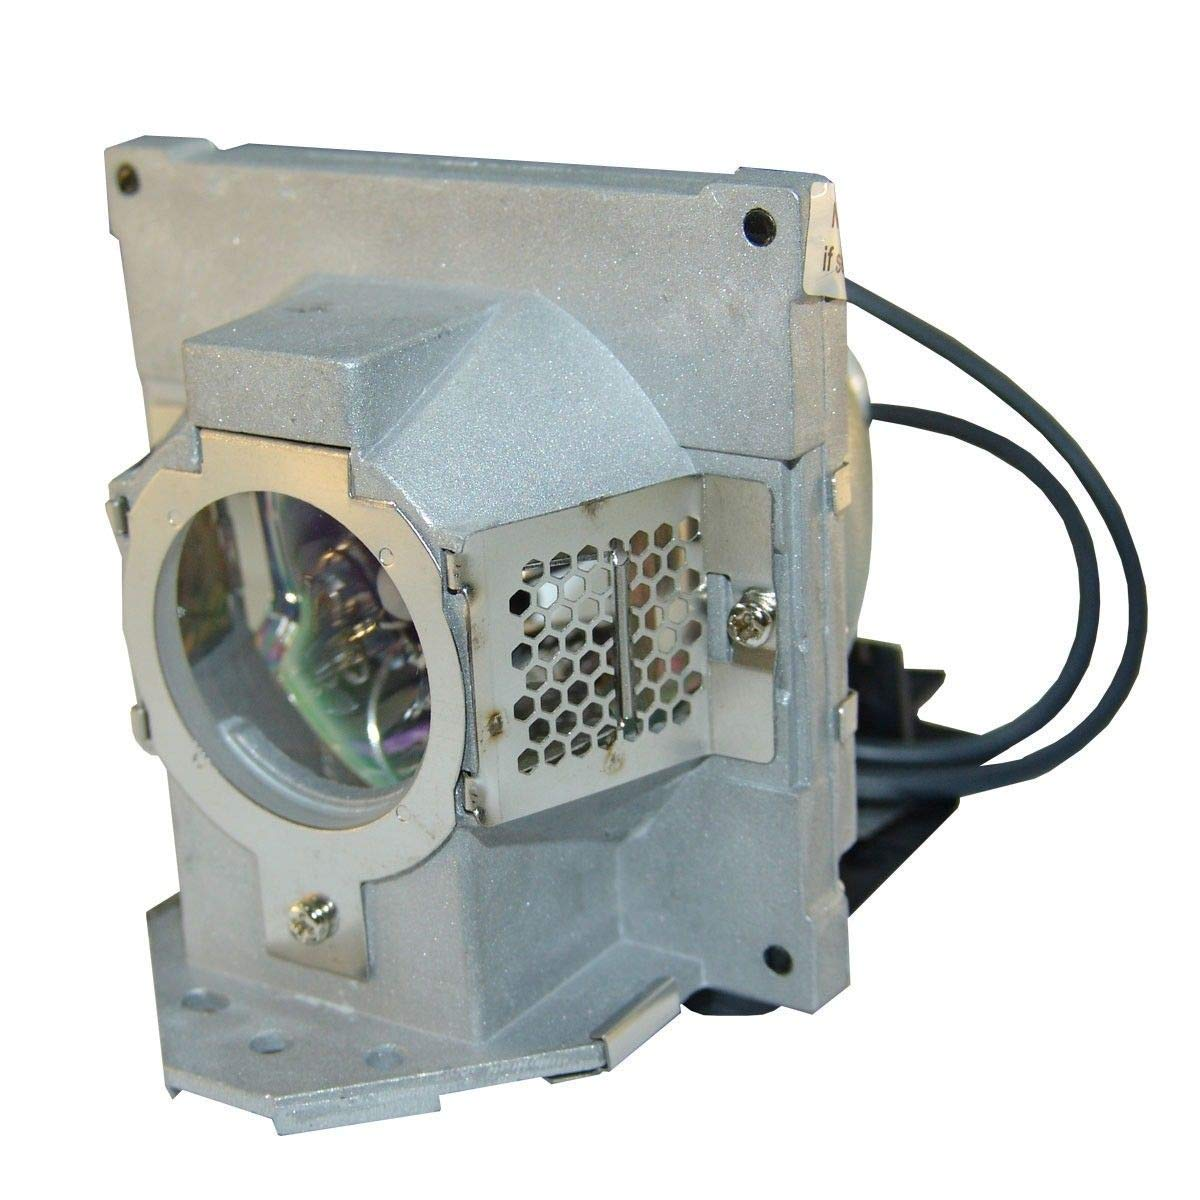 EachLight プロジェクター交換用 ランプ 5J.J2D05.011(右)(互換性のあるランプ) ベンキューBENQ SP920P 対応   B07H5DR8H7